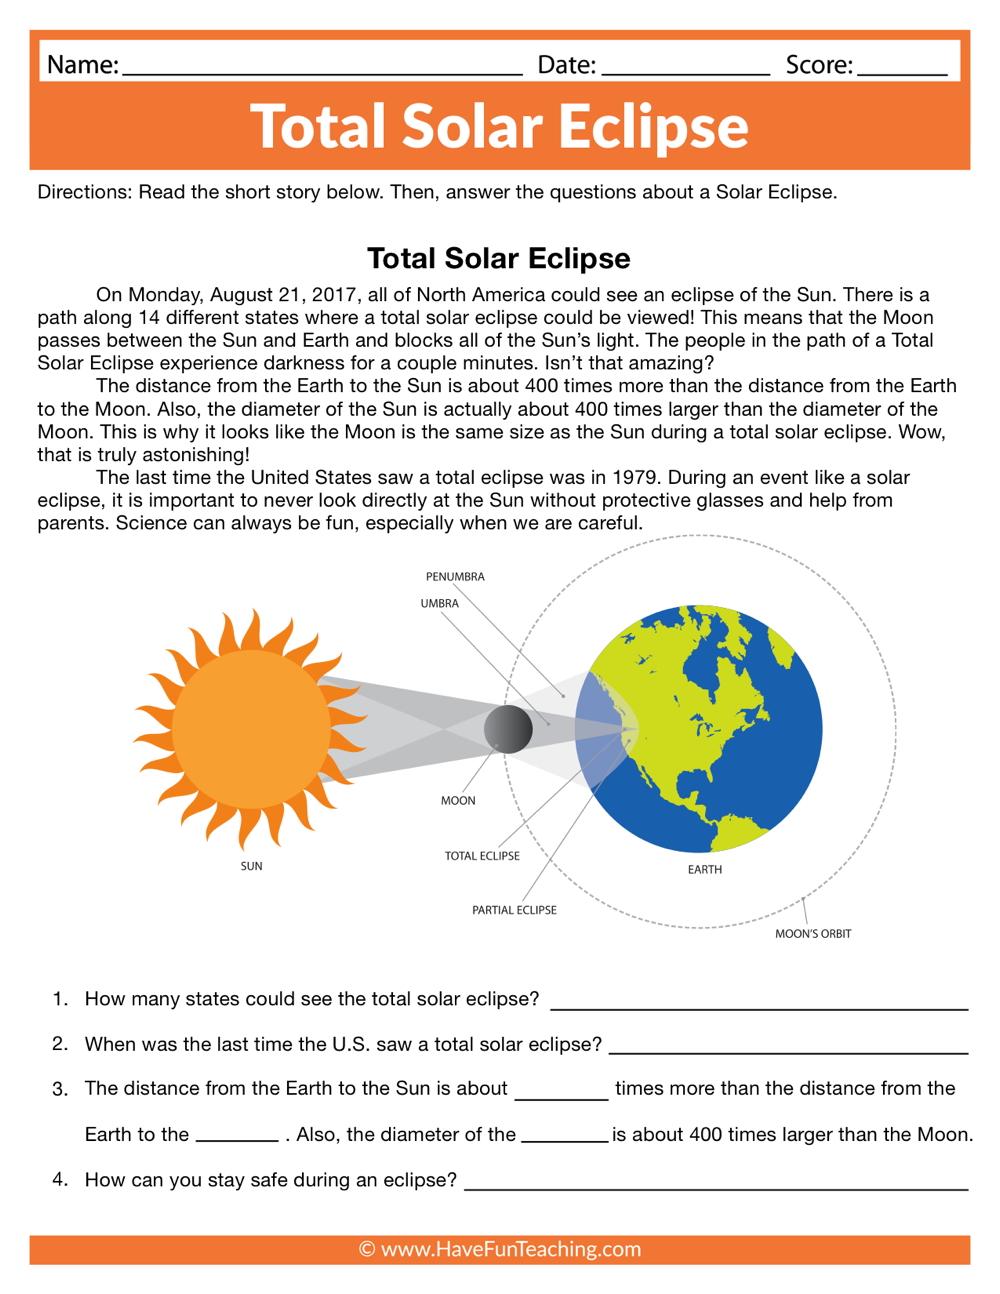 medium resolution of Total Solar Eclipse Worksheet • Have Fun Teaching